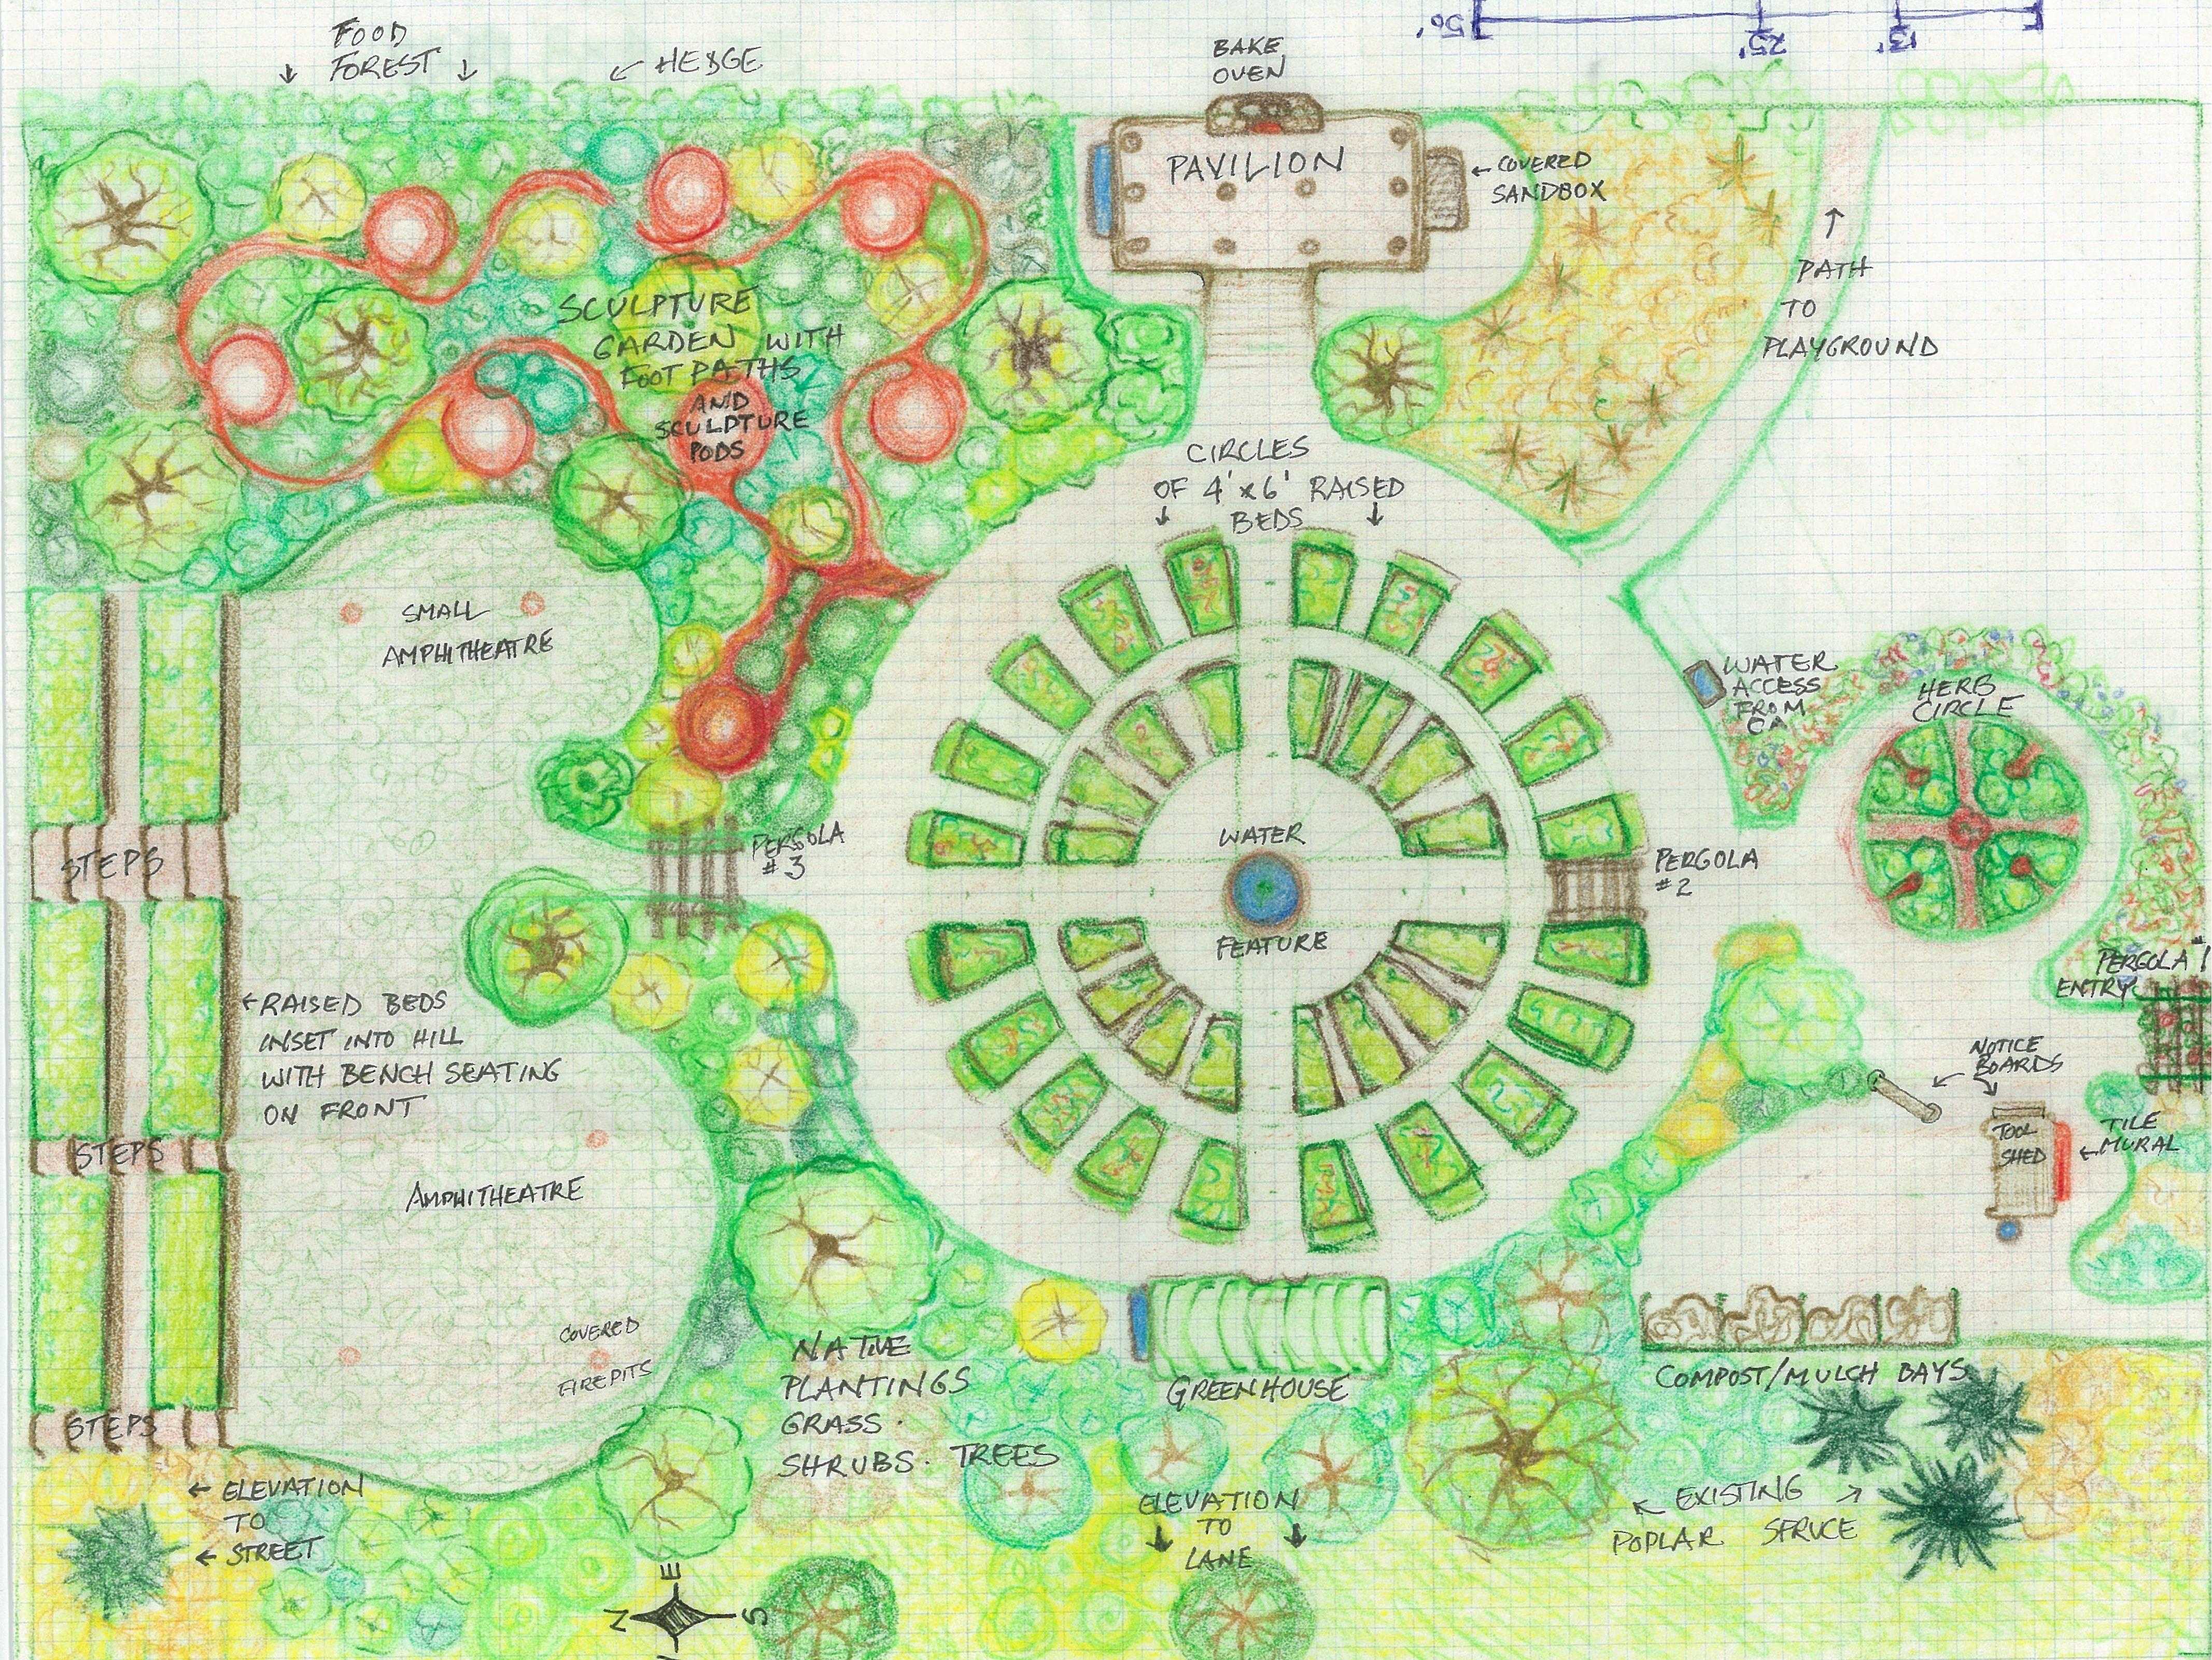 community gardens in open spaces - Google Search | детская площадка ...